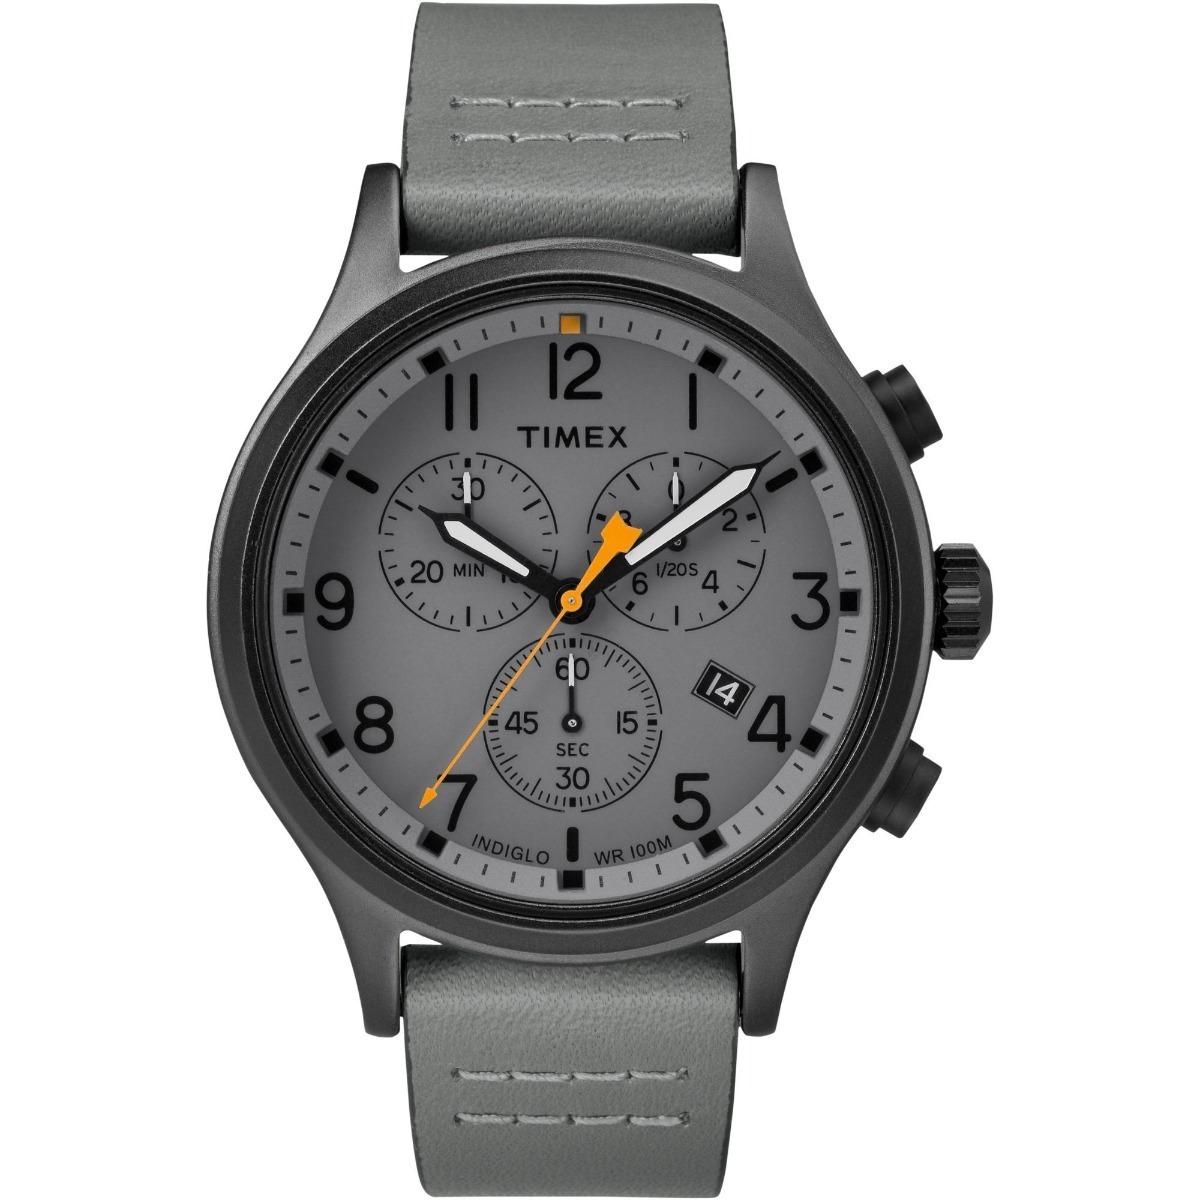 646494eeaad6 reloj timex tw2r47400 100% original para caballero. Cargando zoom.